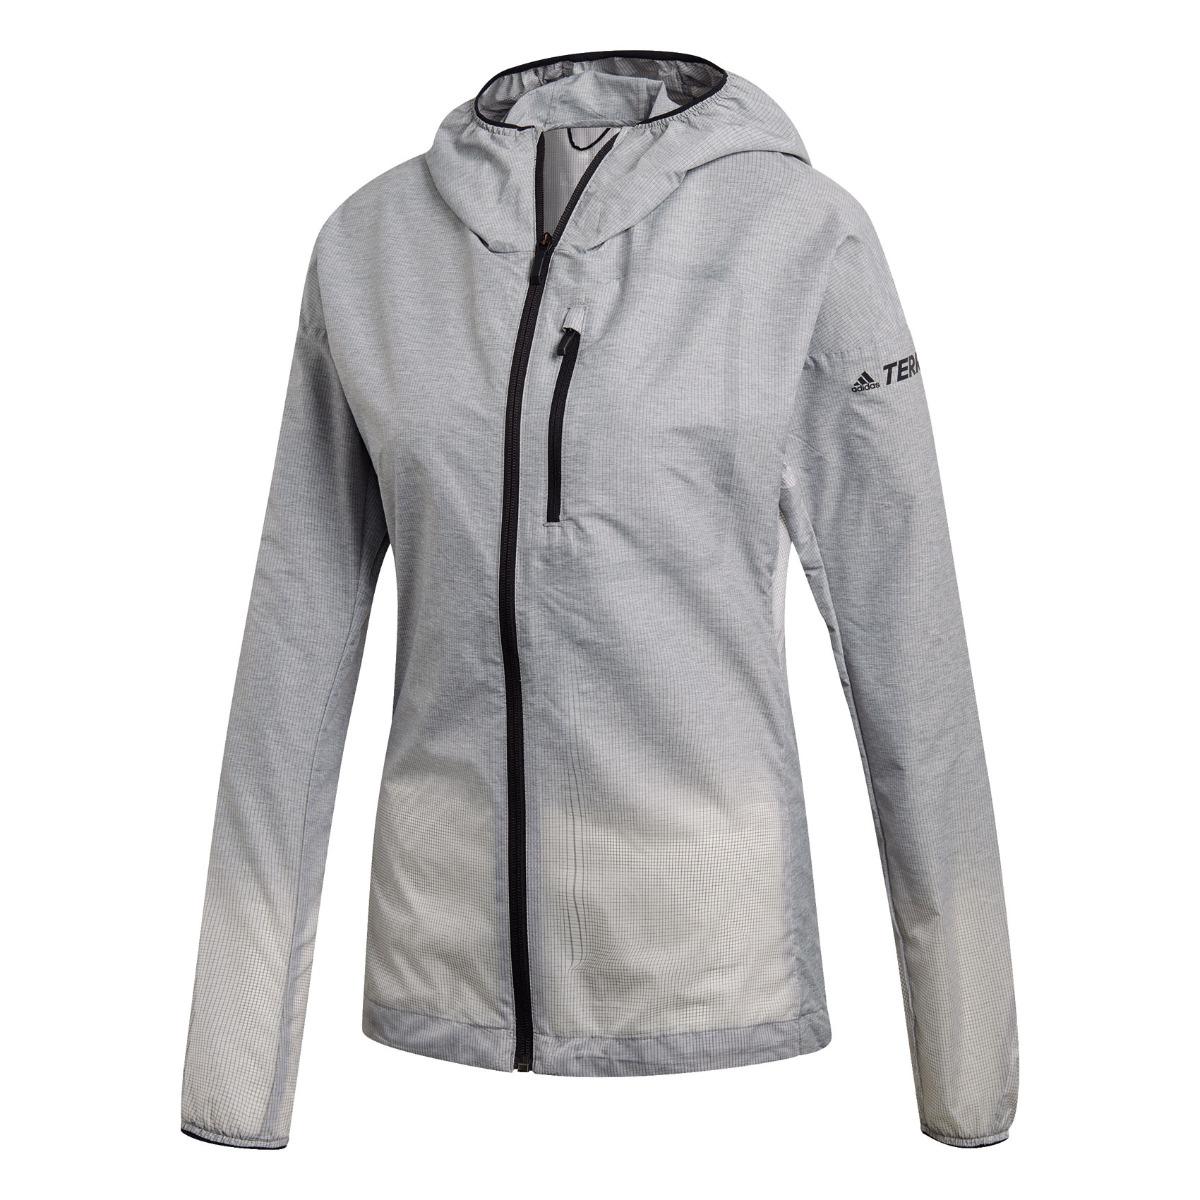 W Agravic Windweave Jacket greywhite